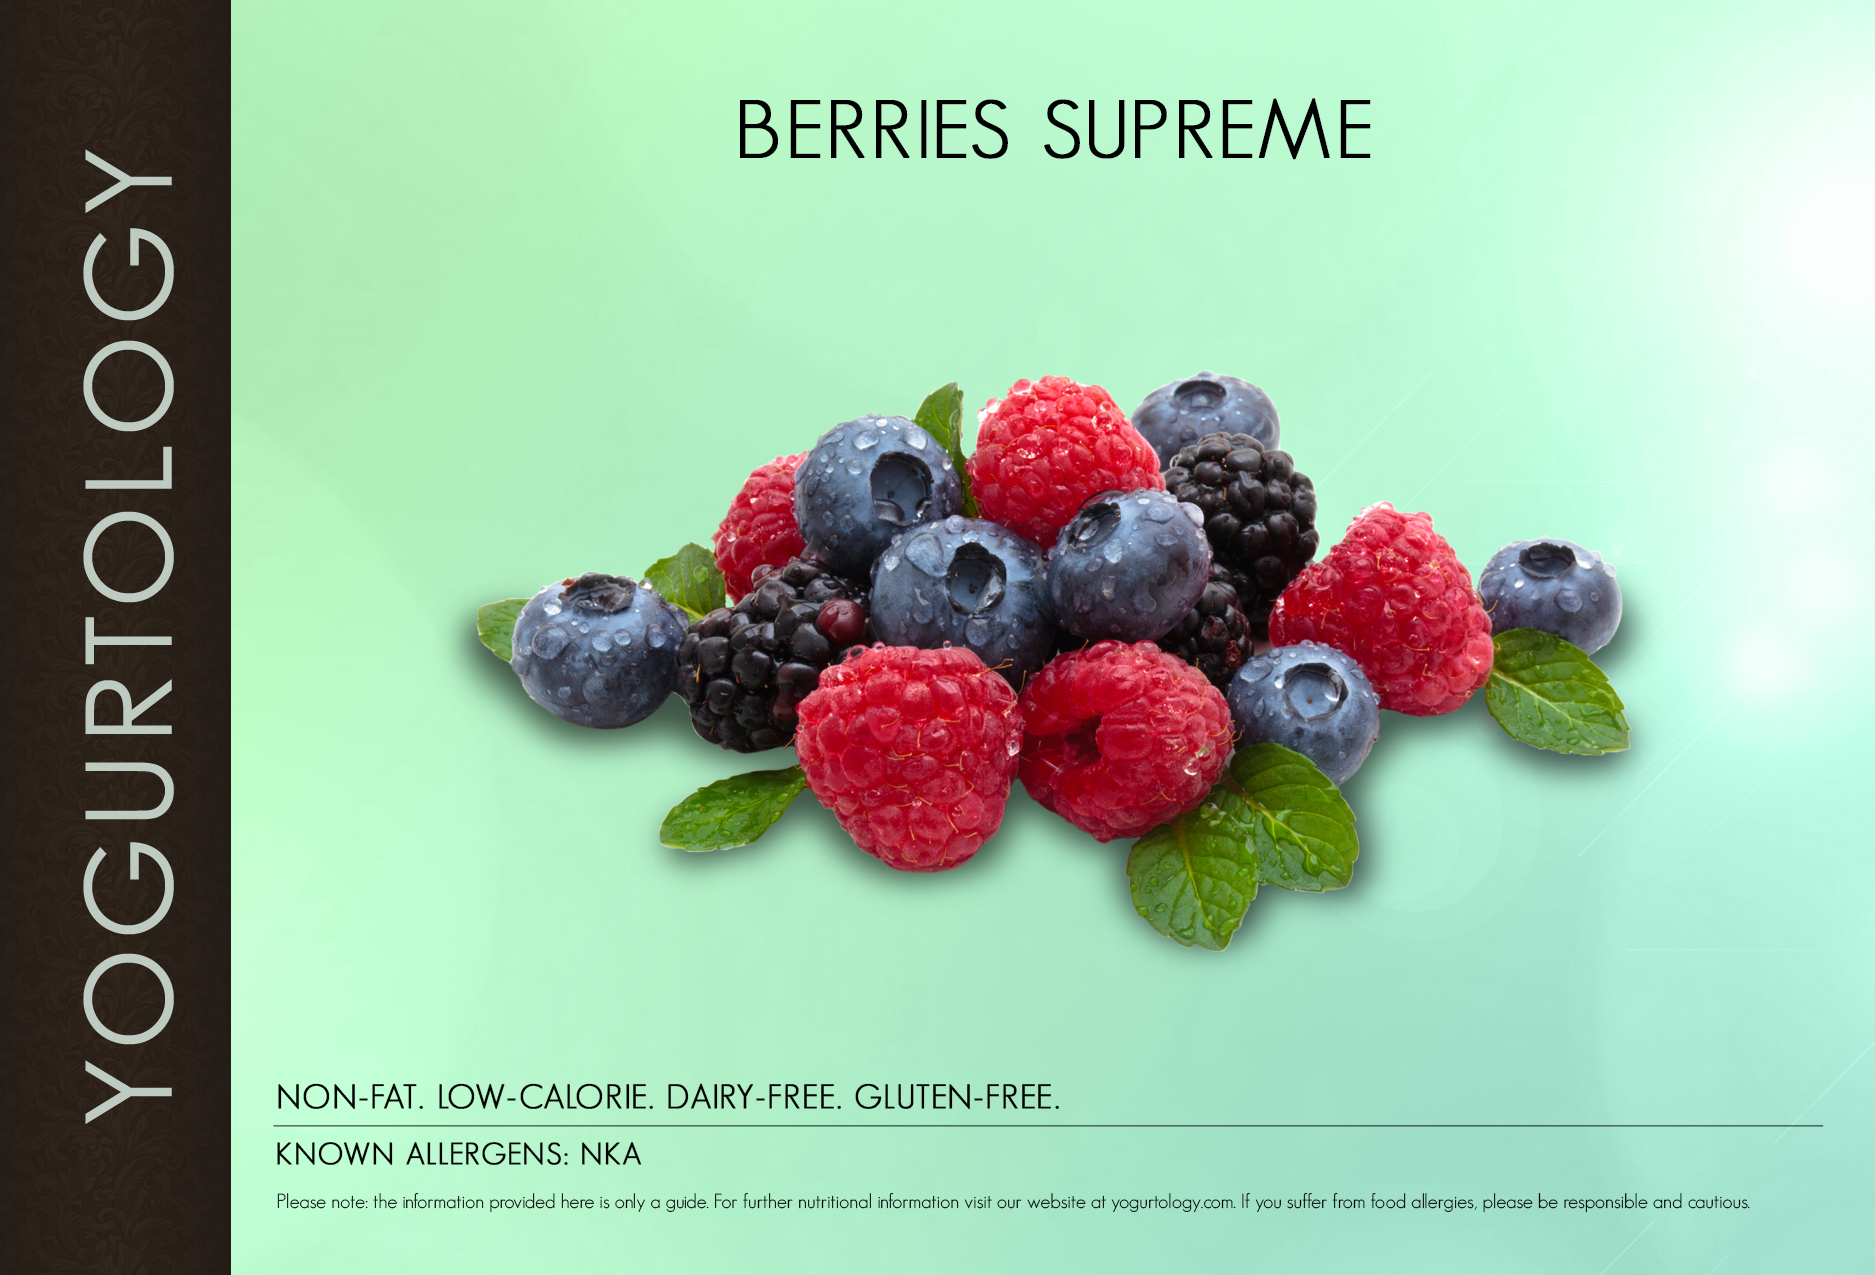 Berries Supreme